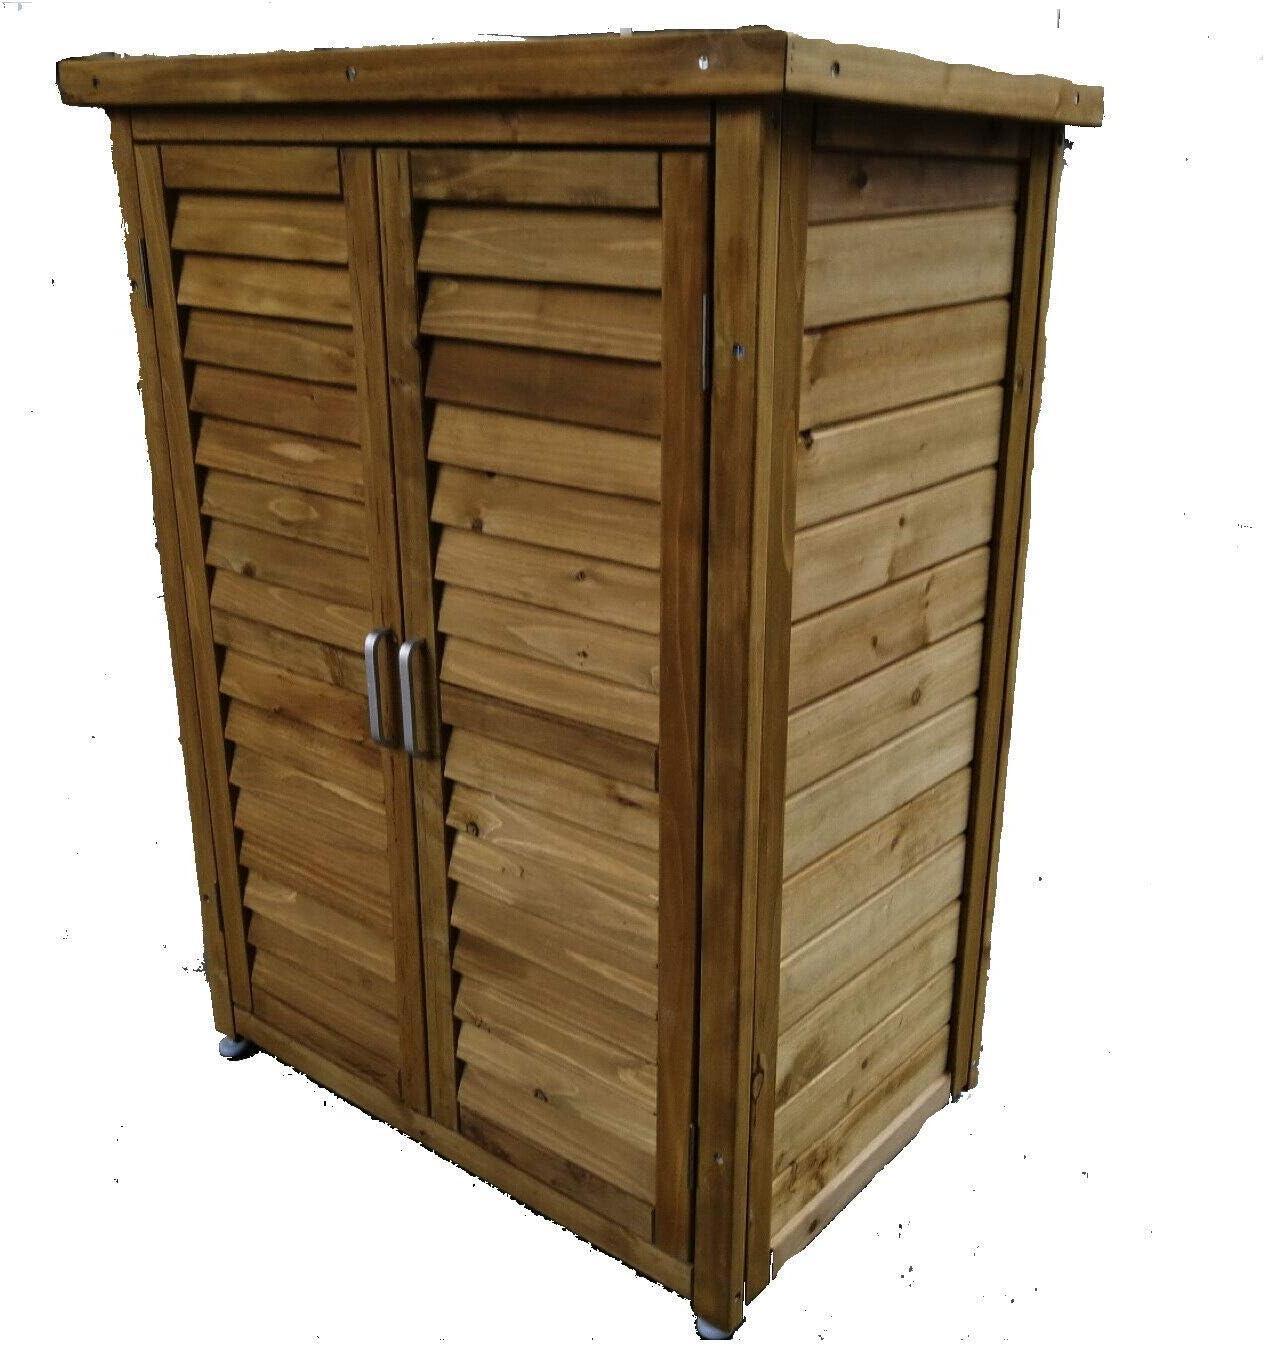 Medium Luebel Outdoor Solid Wooden Storage Cabinet Garden Tools DIY Storage Cabinet And Organiser In Medium Or Large Garage Cabinet